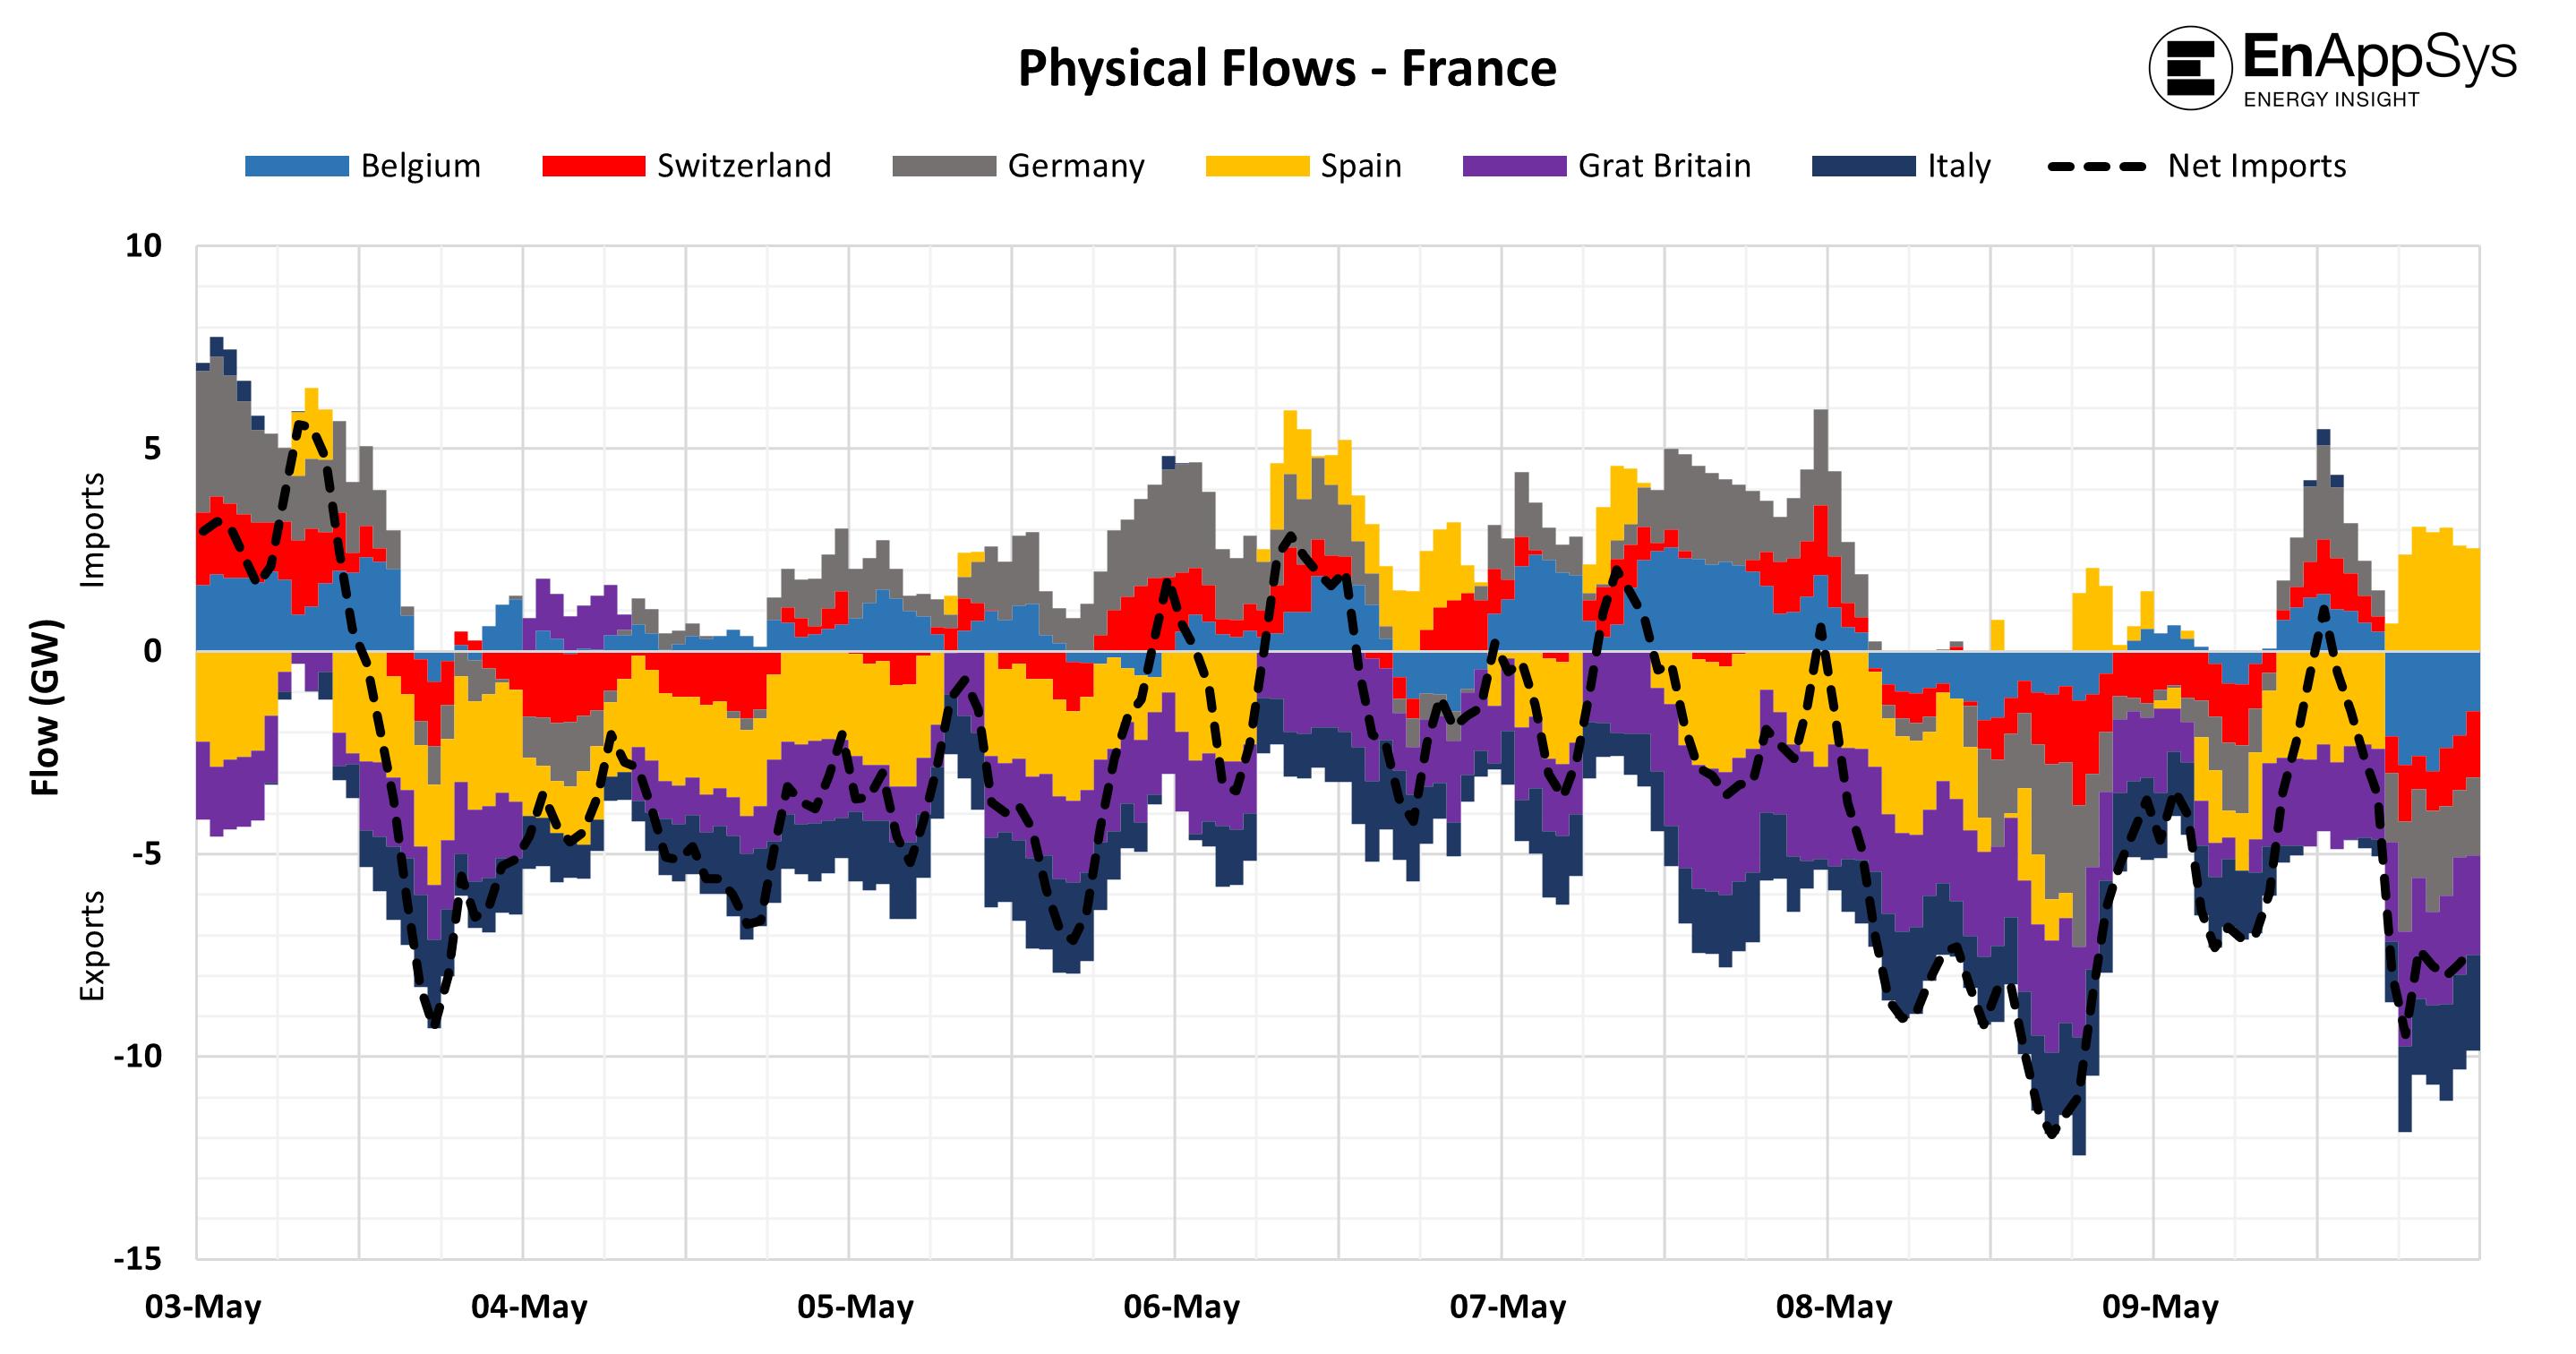 Figure 2: Physical Flows - France